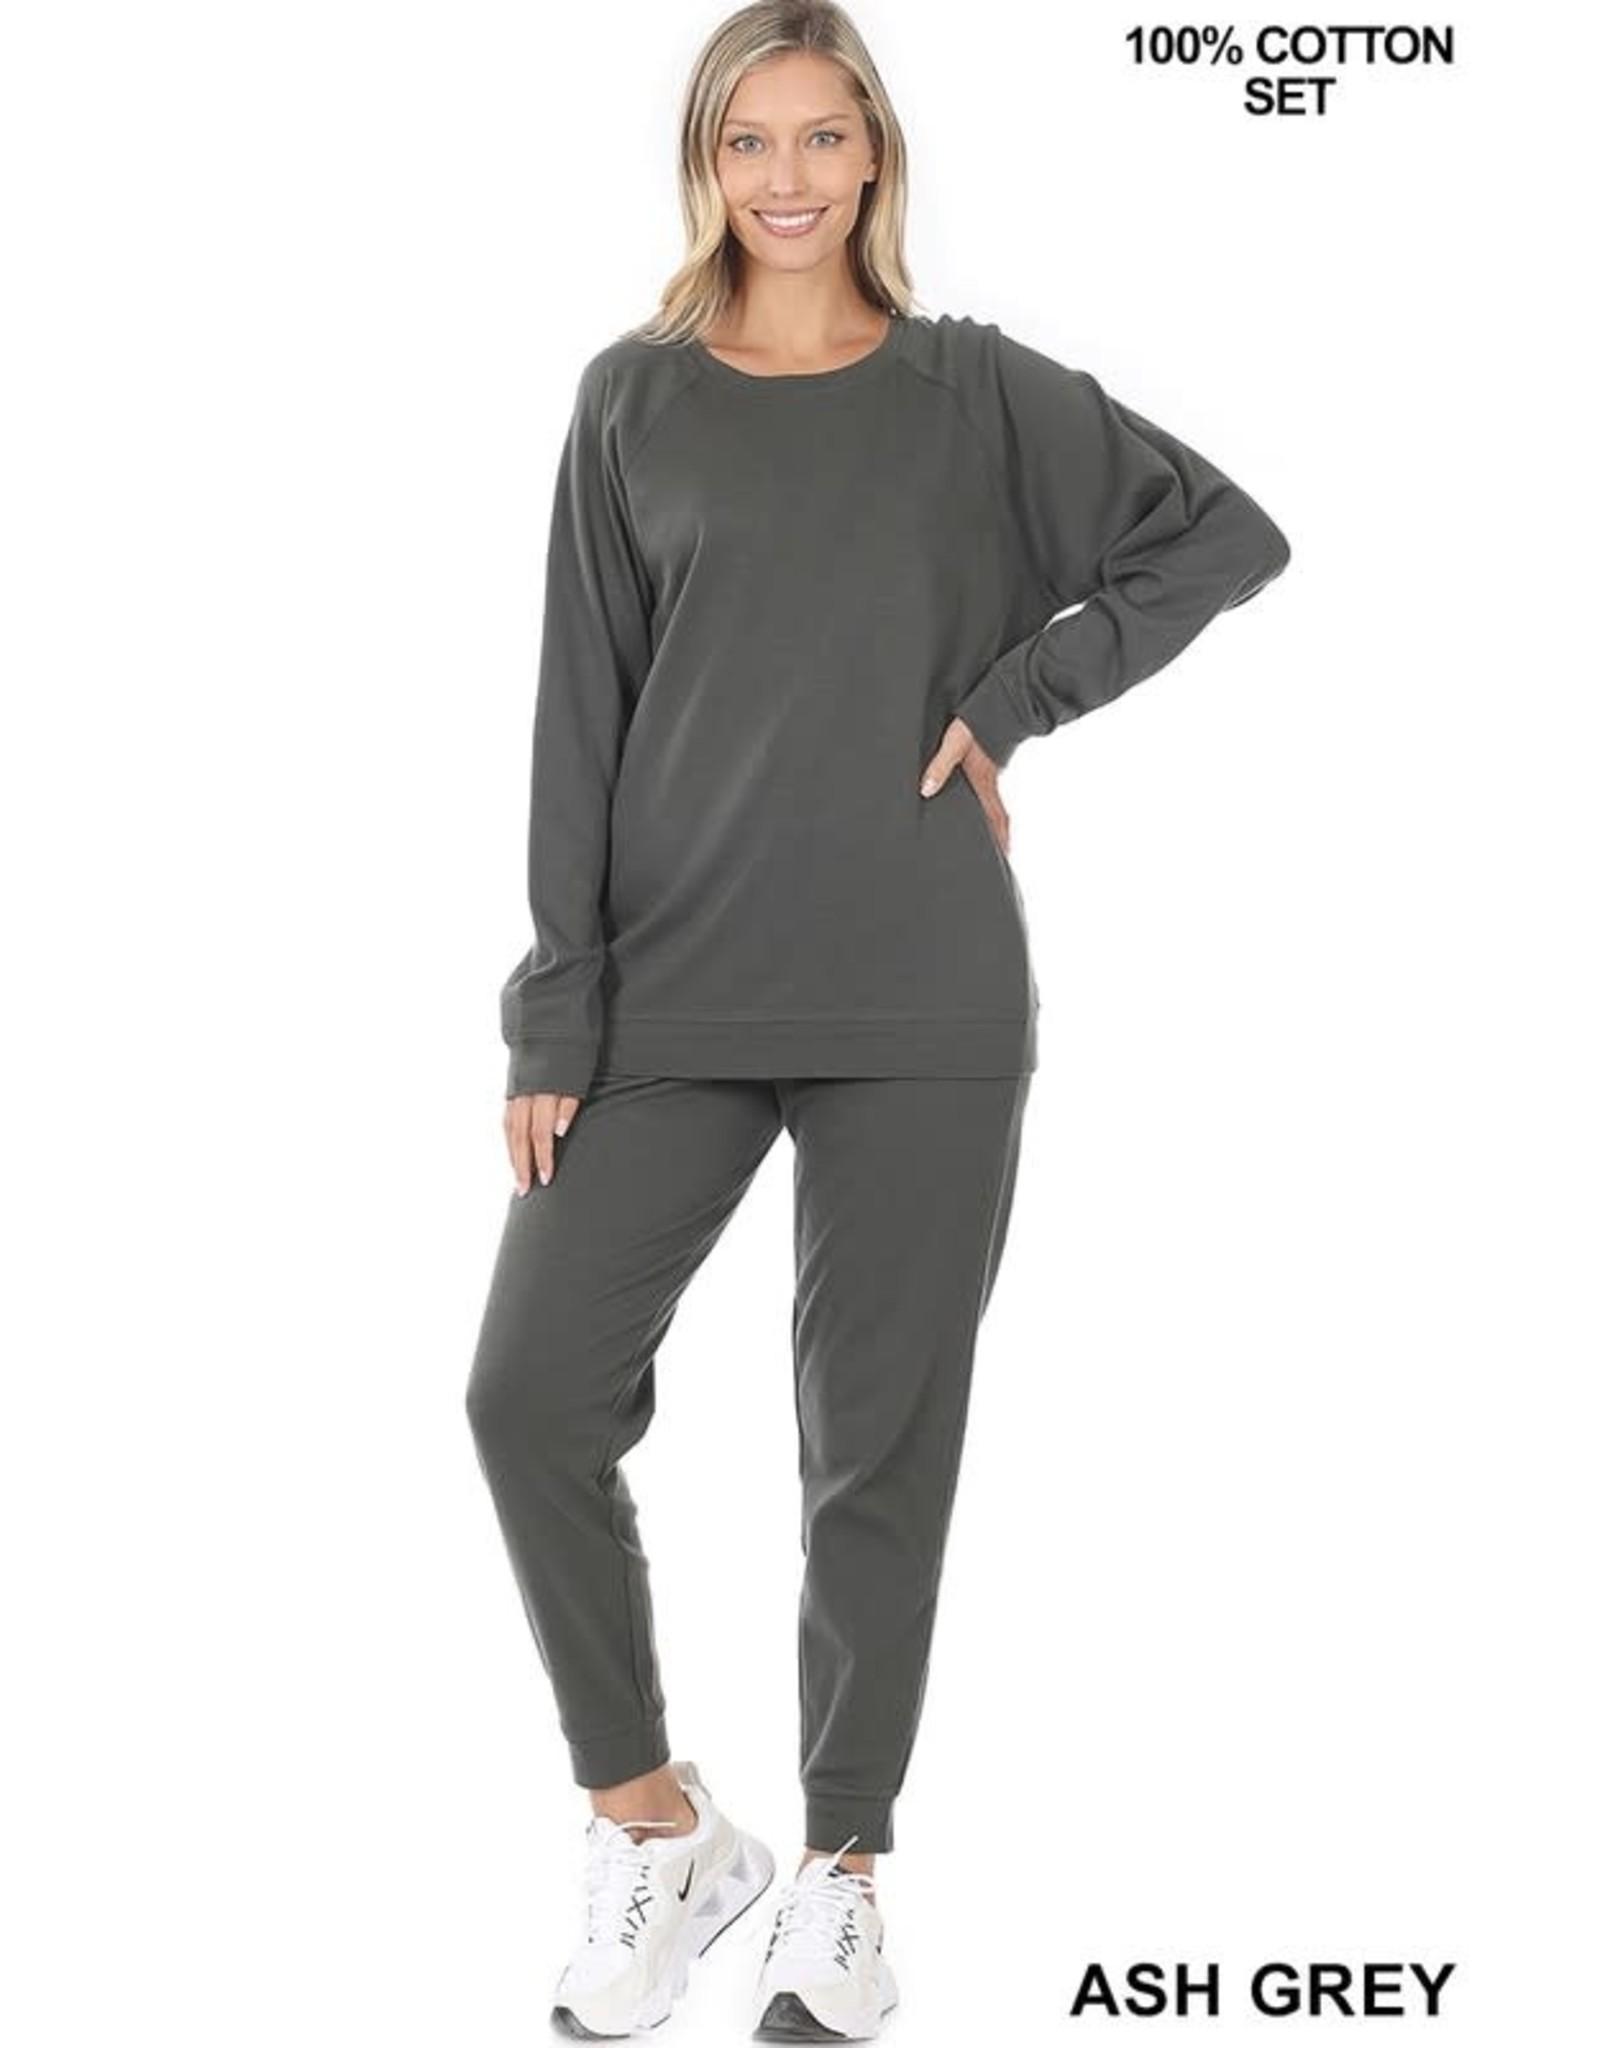 Sweater & Jogger Set